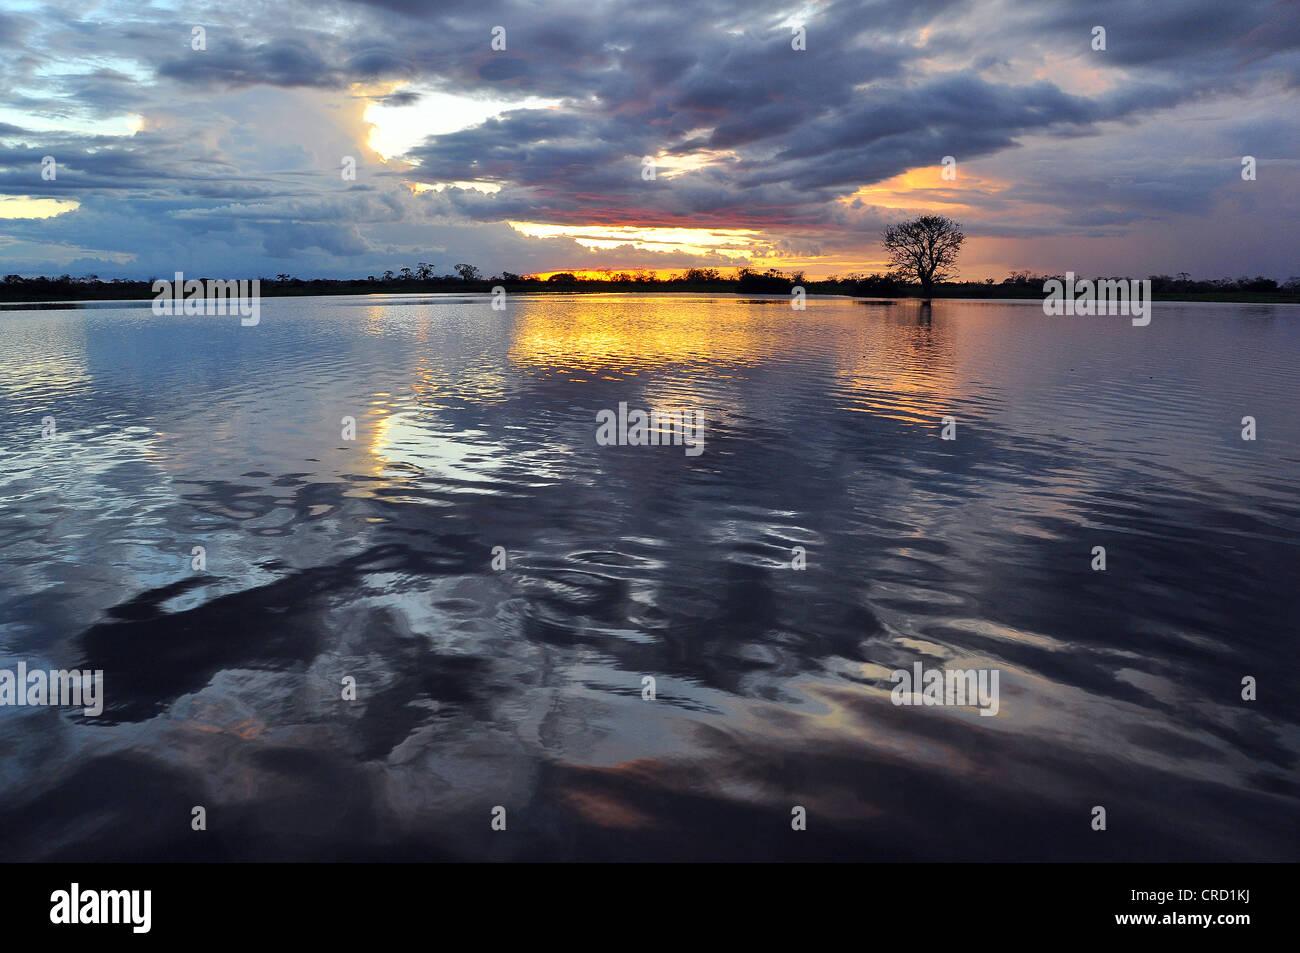 Sunset in the Amazon region, Mamiraua Reserve near Tefe, Amazonas, Brazil, South America - Stock Image